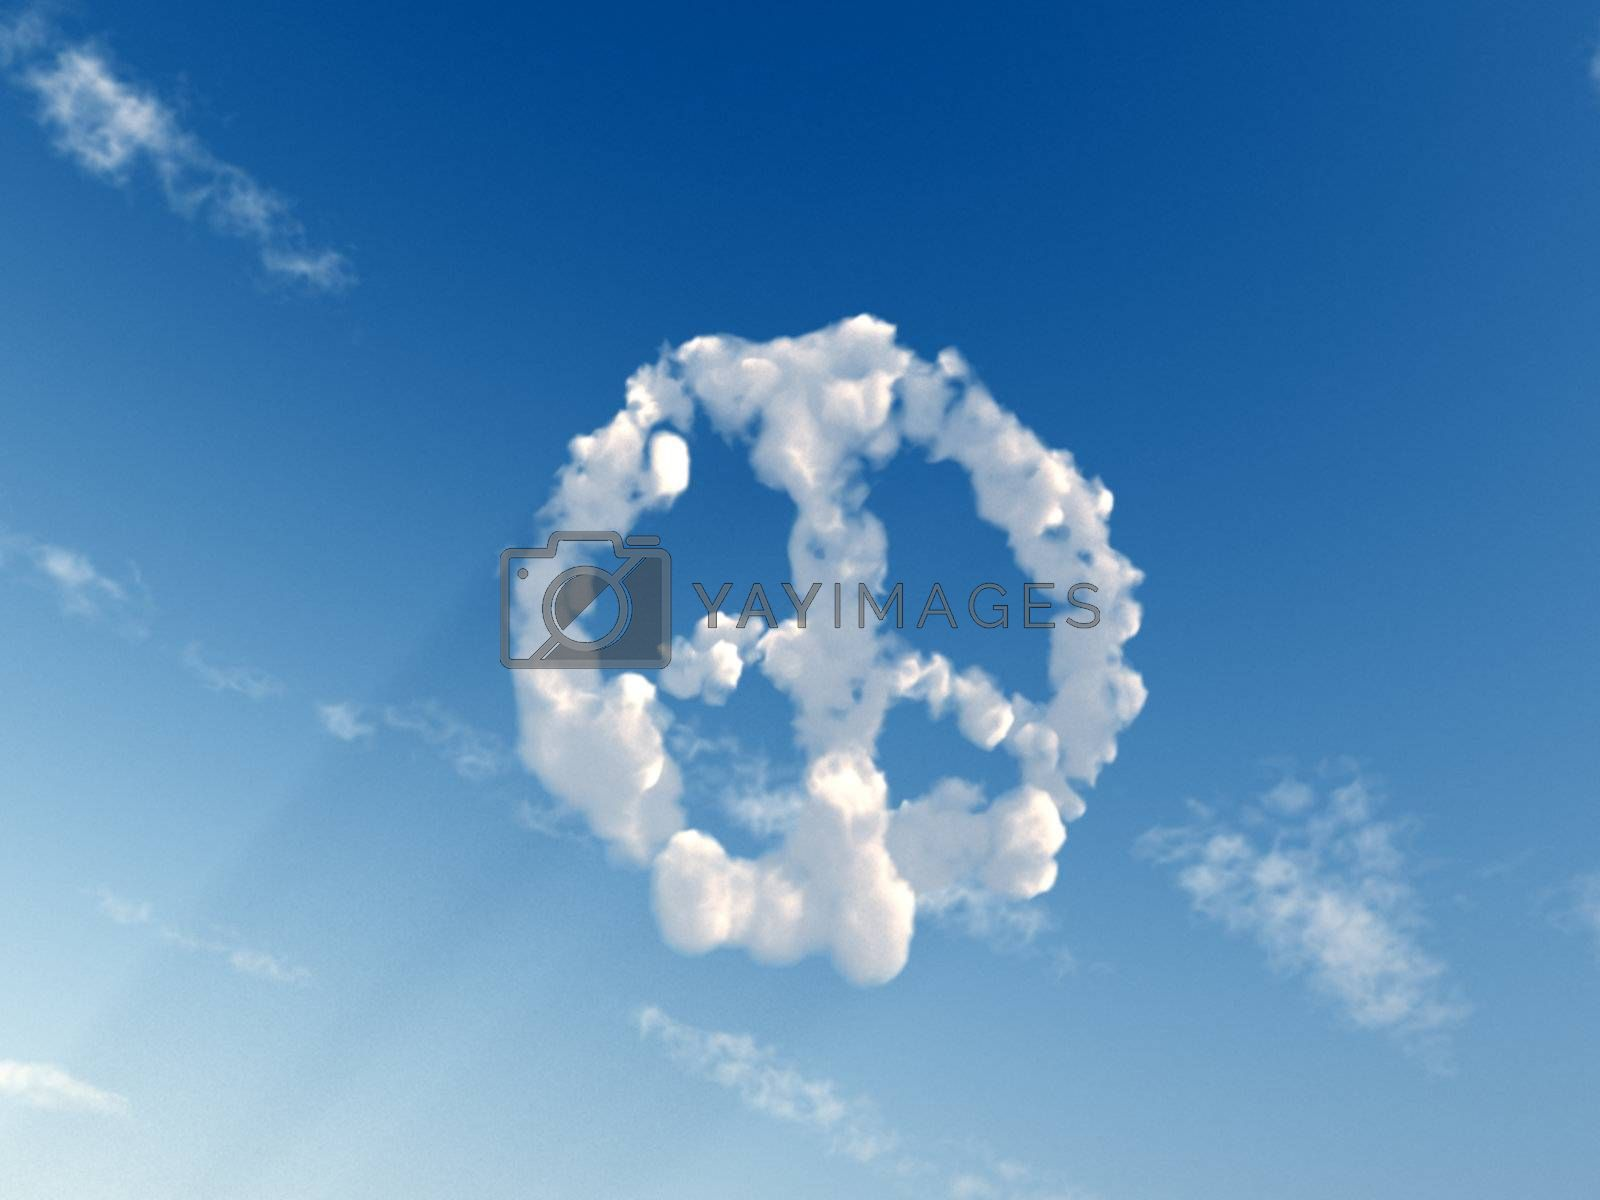 peace symbol on the sky - 3d illustration